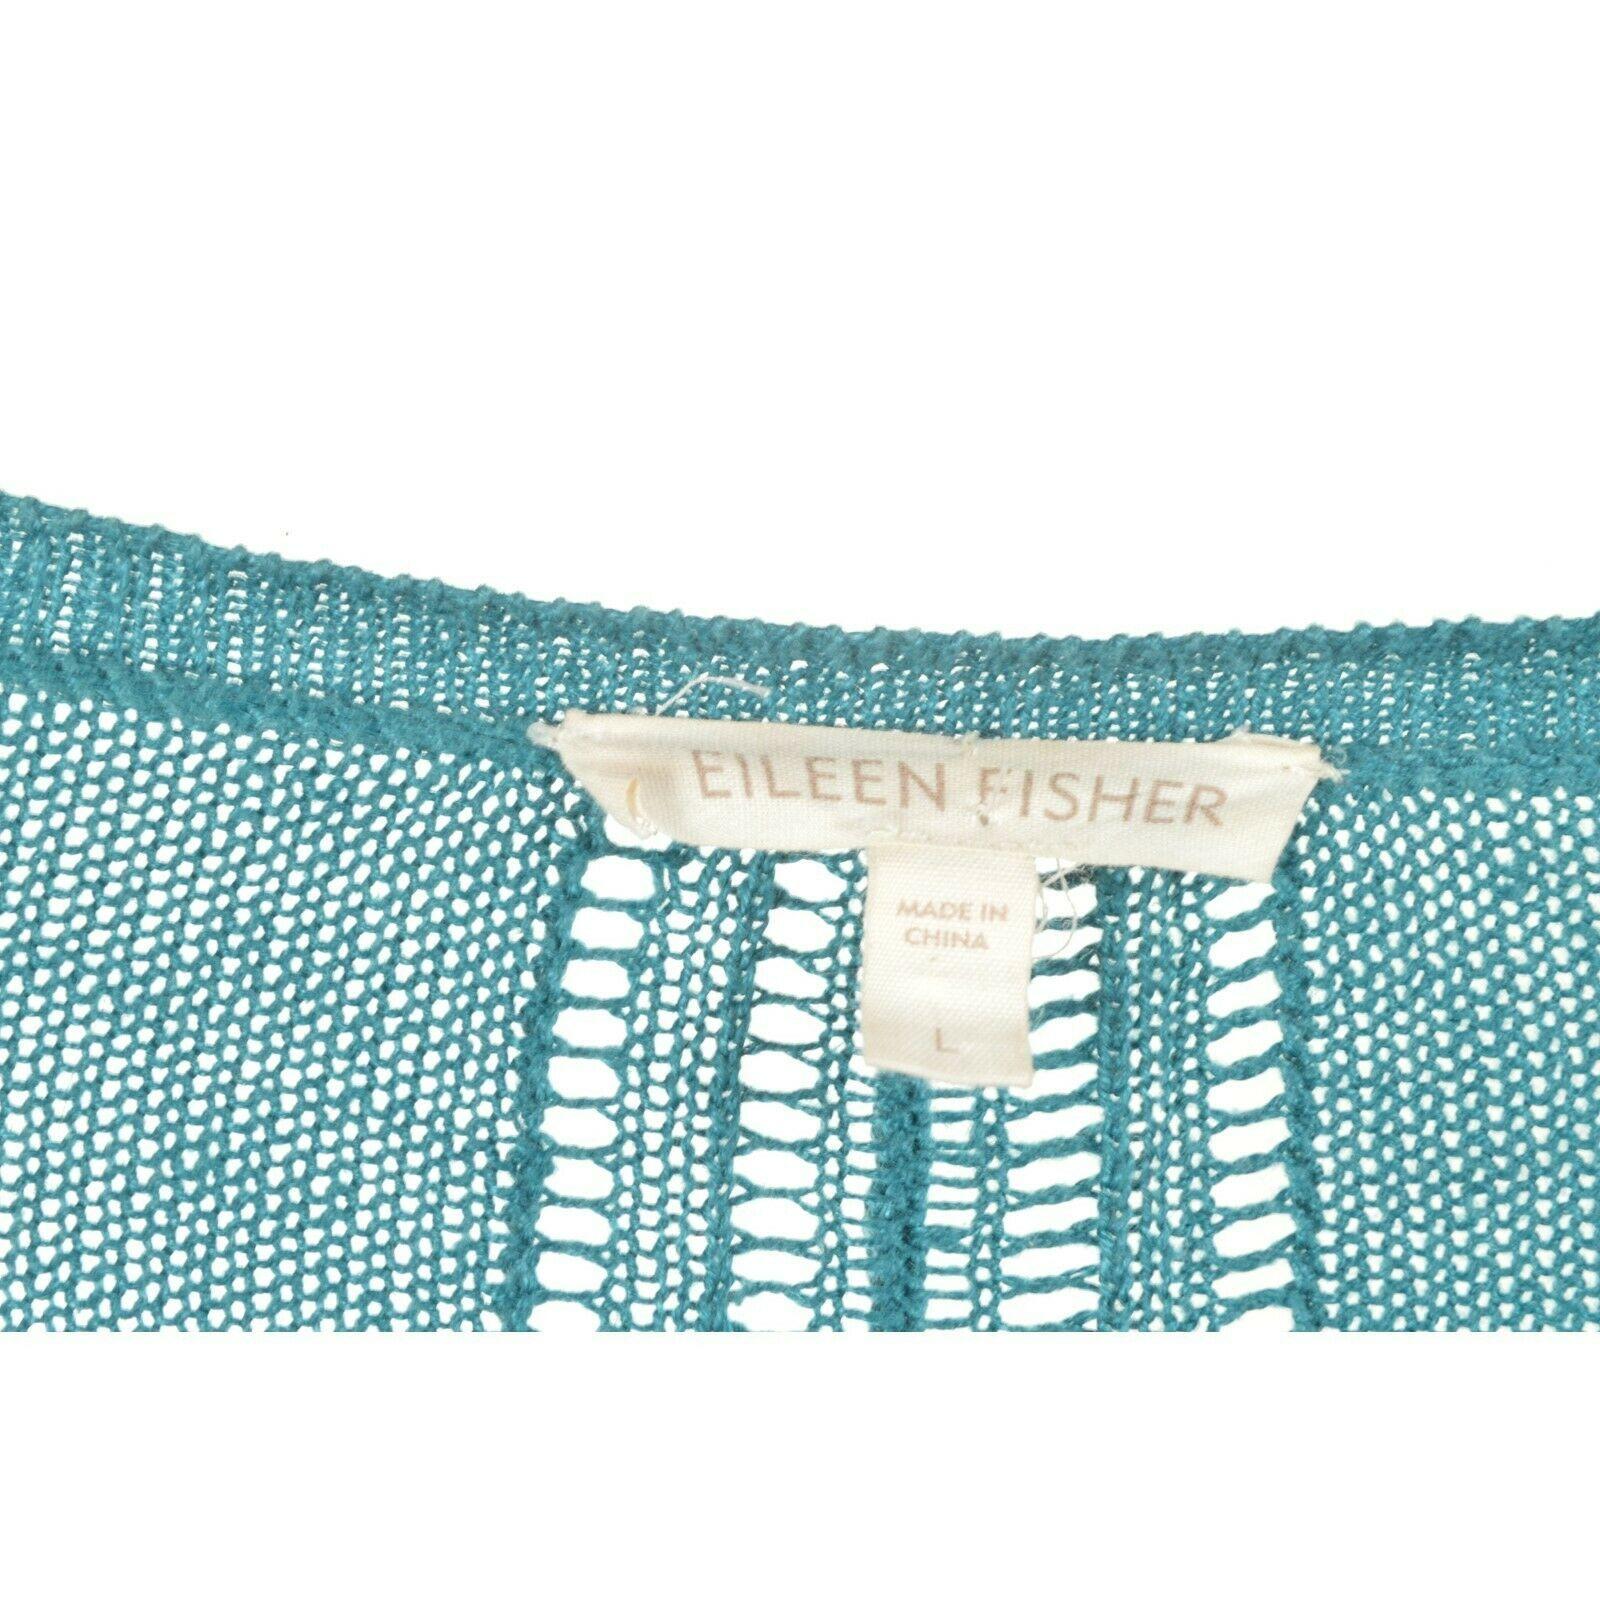 Eileen Fisher sweater cardigan SZ L teal 100% linen knit pockets soft long s image 6